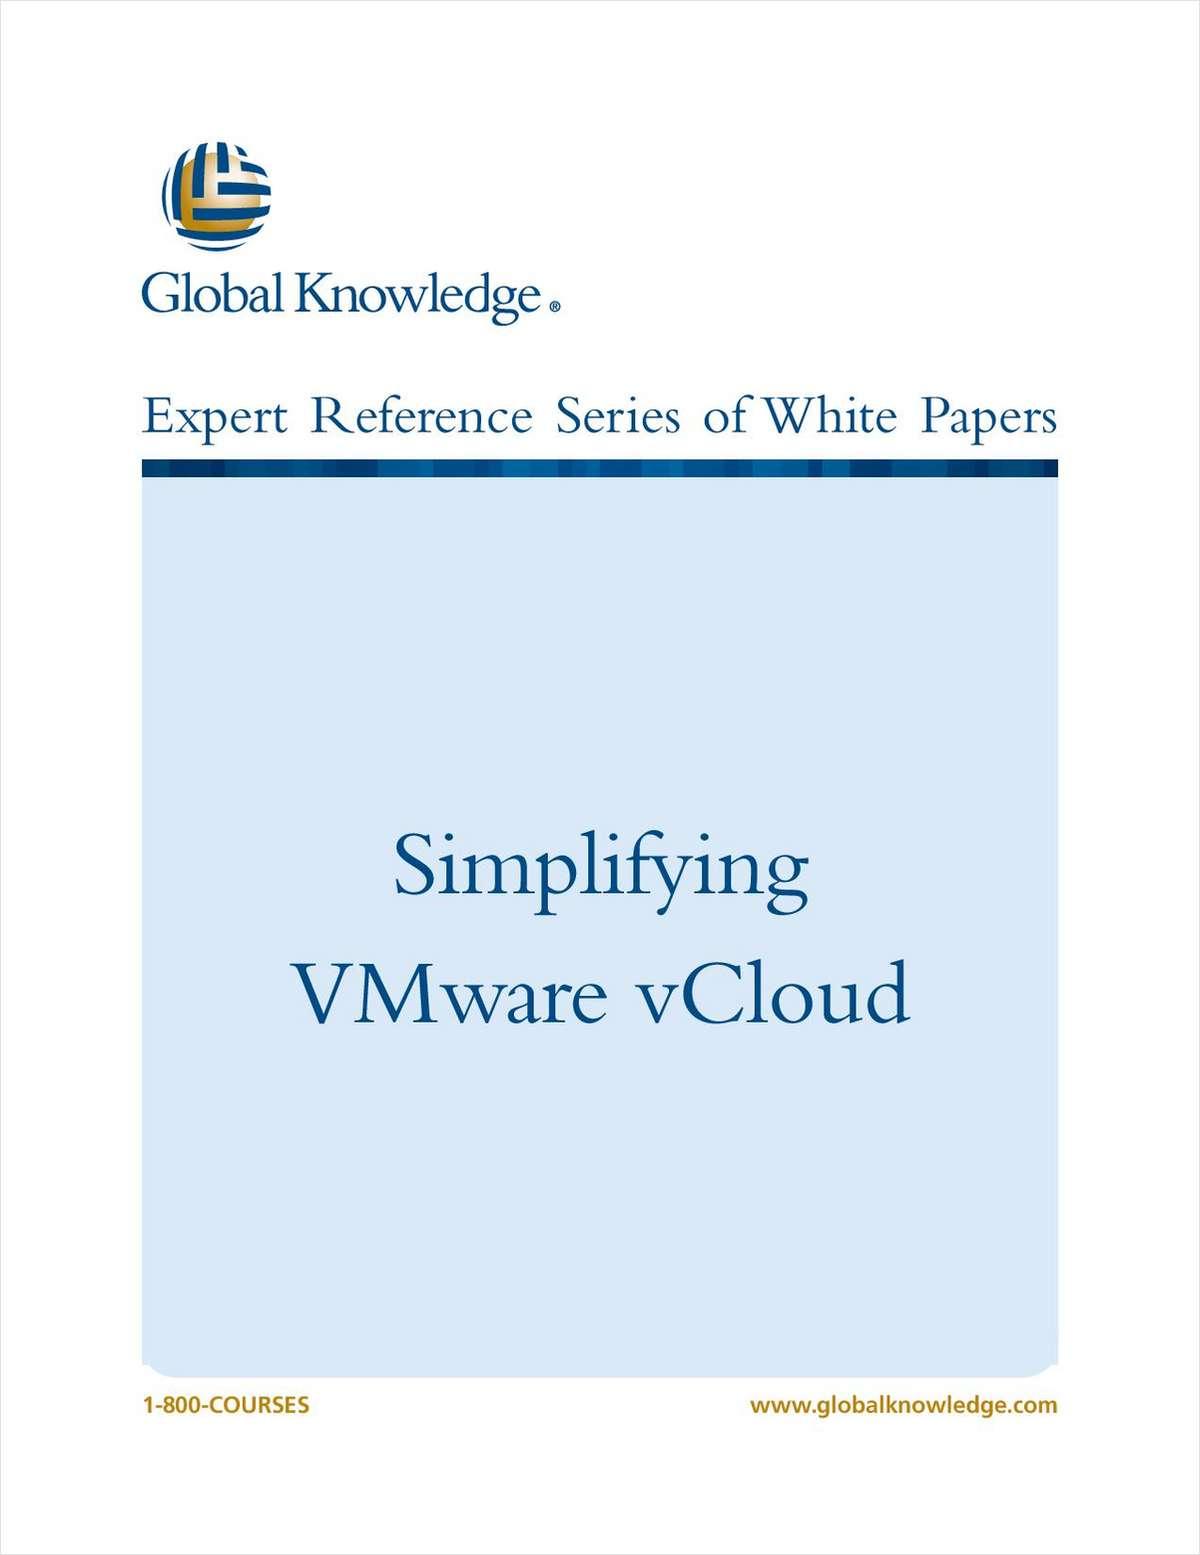 Simplifying VMware vCloud